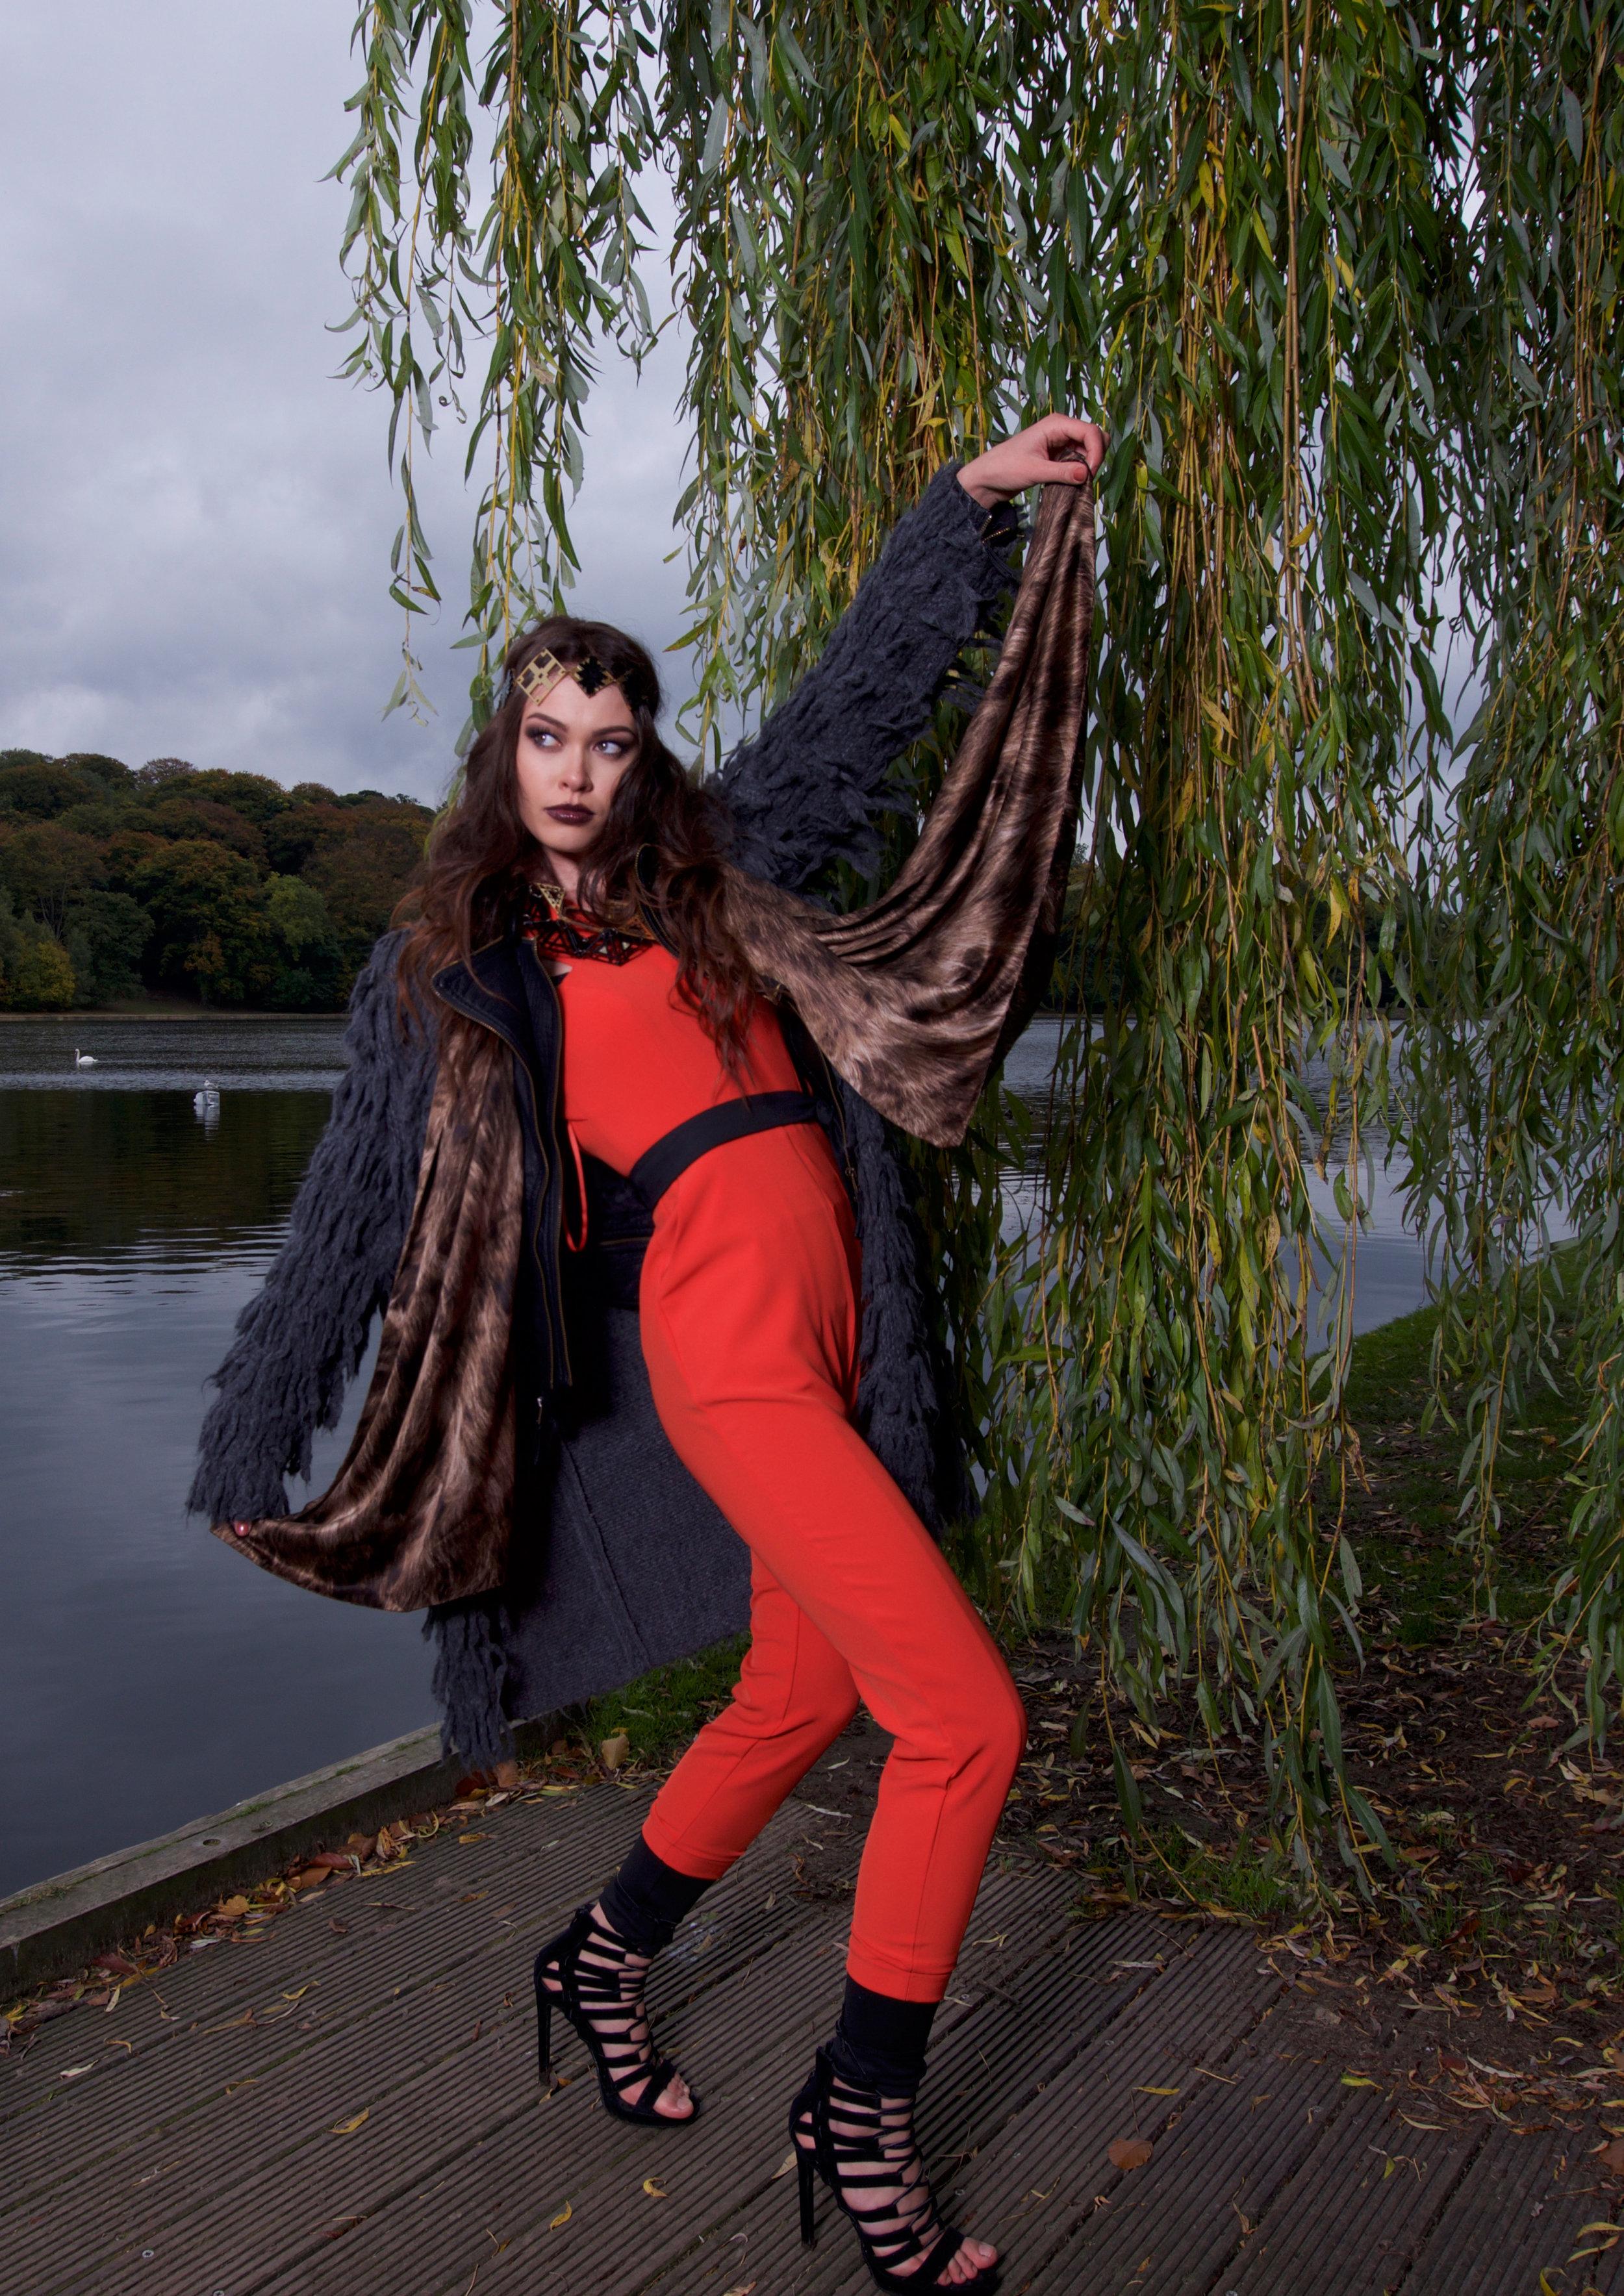 zaramia-ava-zaramiaava-leeds-fashion-designer-ethical-sustainable-tailored-minimalist-jacket-accent-coat-jacket-print-shirt-top-versatile-drape-cowl-styling-shop-womenswear-models-photoshoot-colour-15